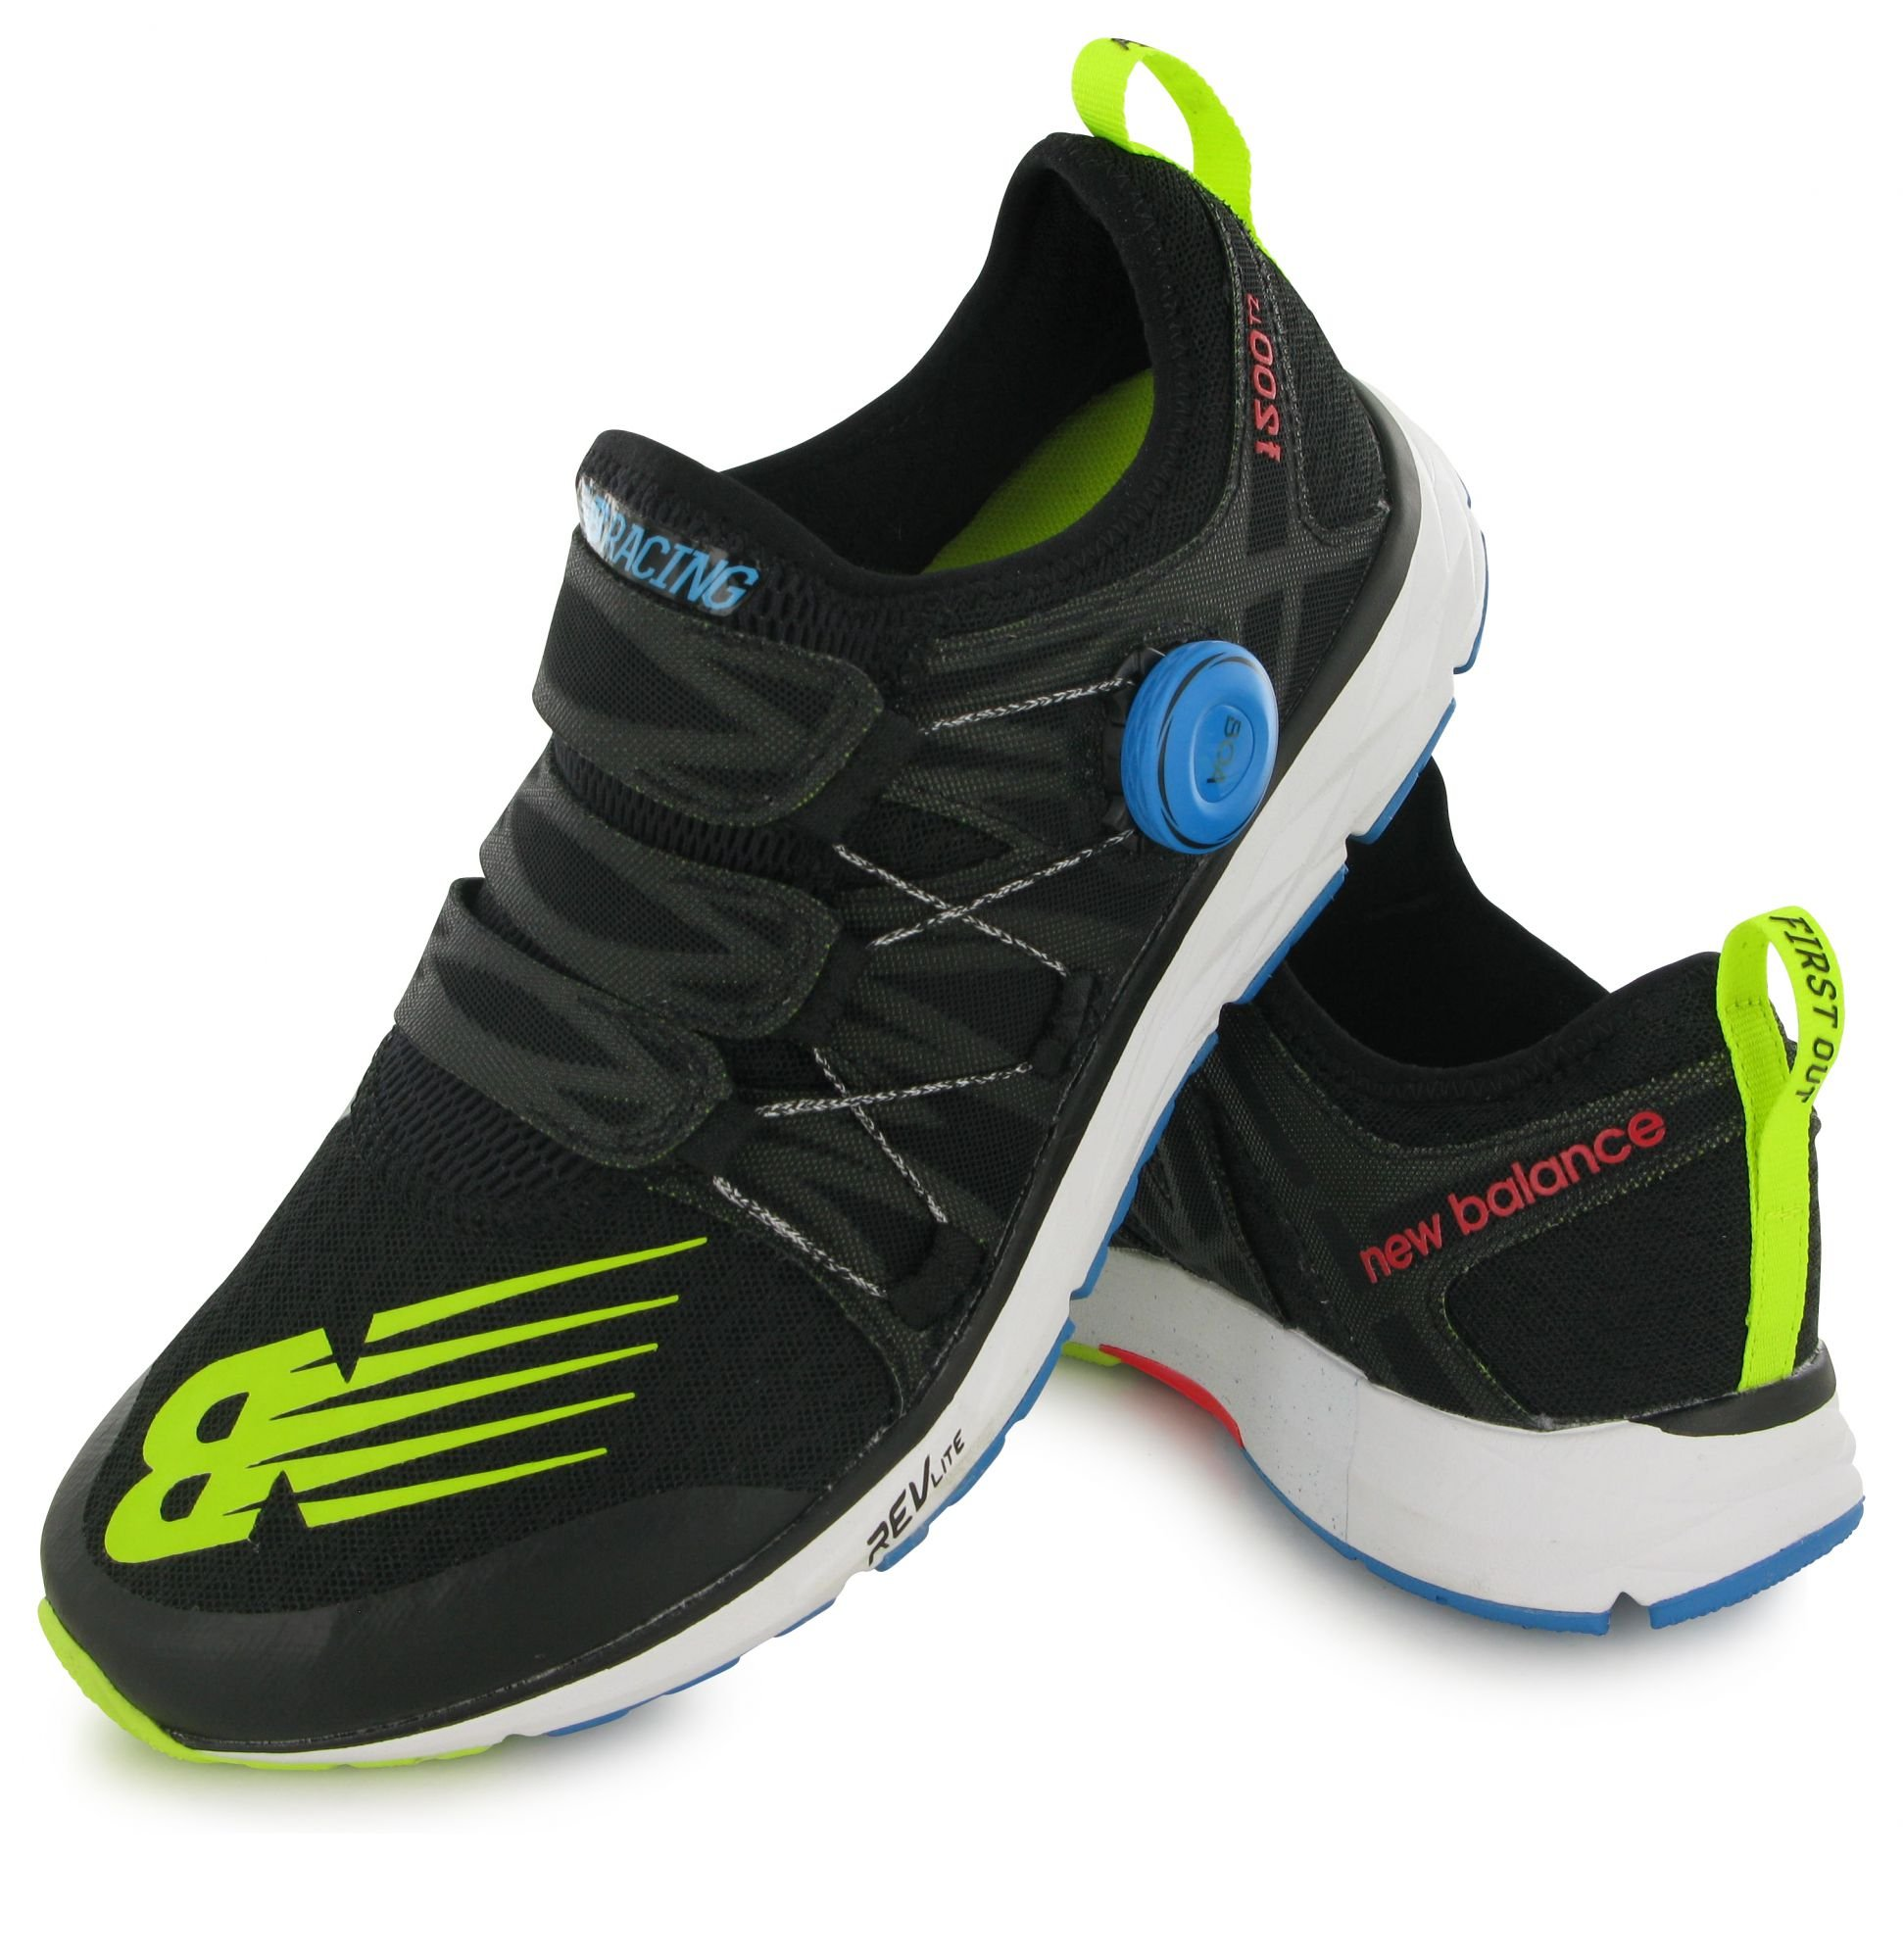 81%2BtmQWW0yL - New Balance Men's M1500v4 Boa Closure Running Shoes